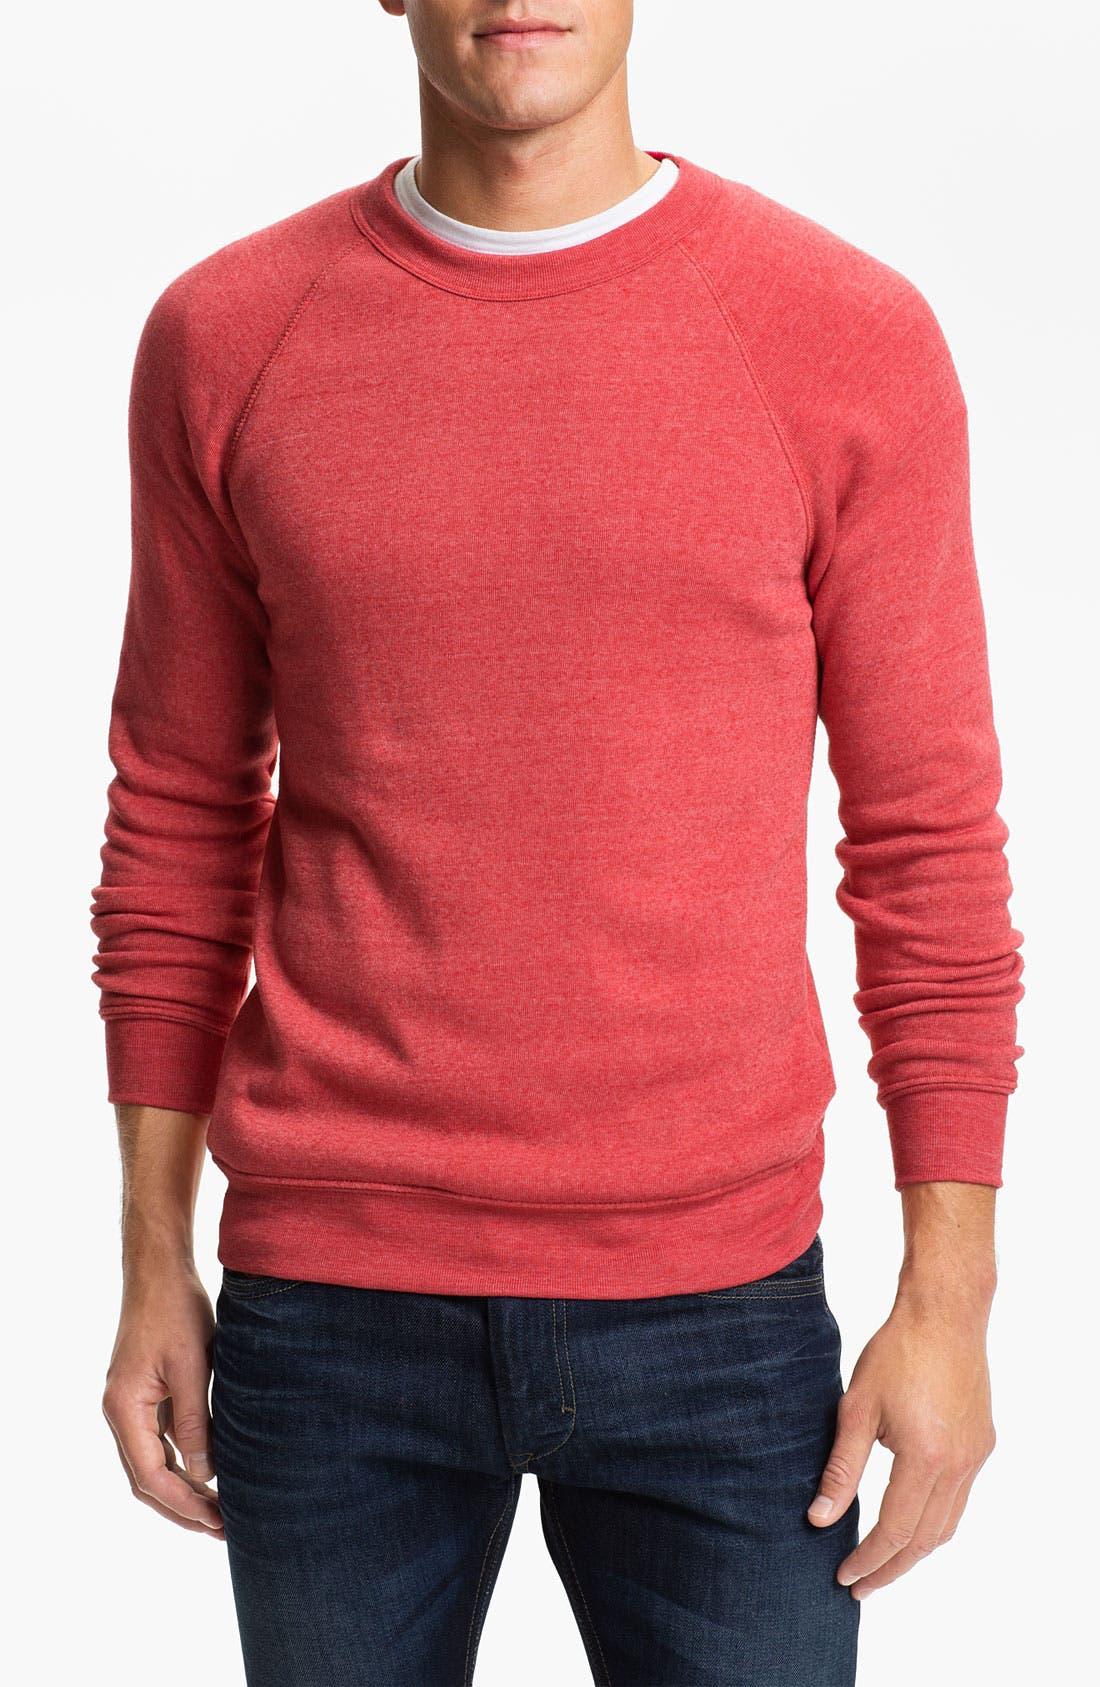 'The Champ' Sweatshirt,                             Main thumbnail 15, color,